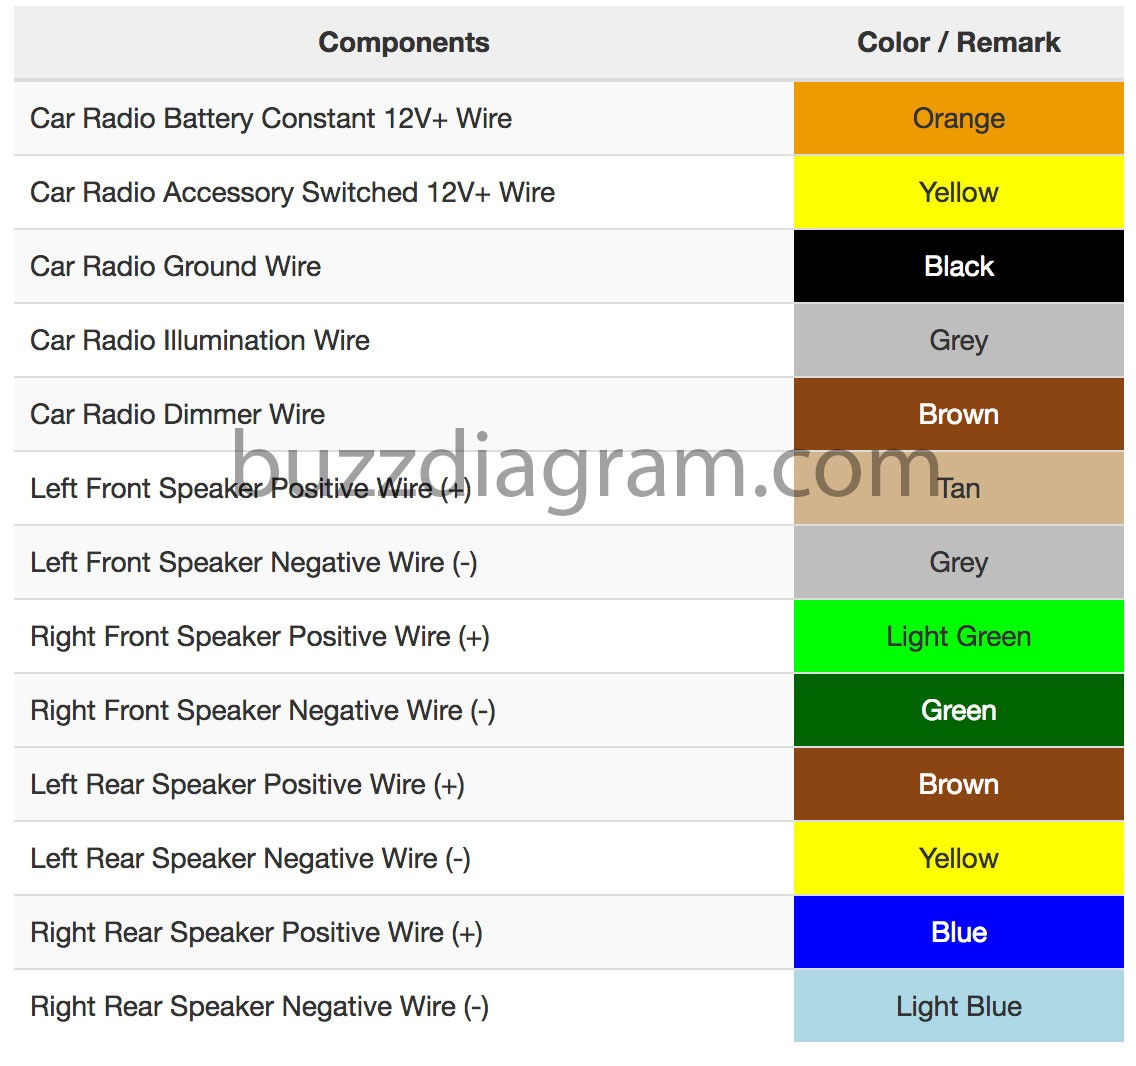 1998 Buick Century Radio Wiring Diagram - How To Wire A Brake Light Switch  - hyundaiii.yenpancane.jeanjaures37.fr | 1998 Buick Regal Radio Wiring Diagram |  | Wiring Diagram Resource